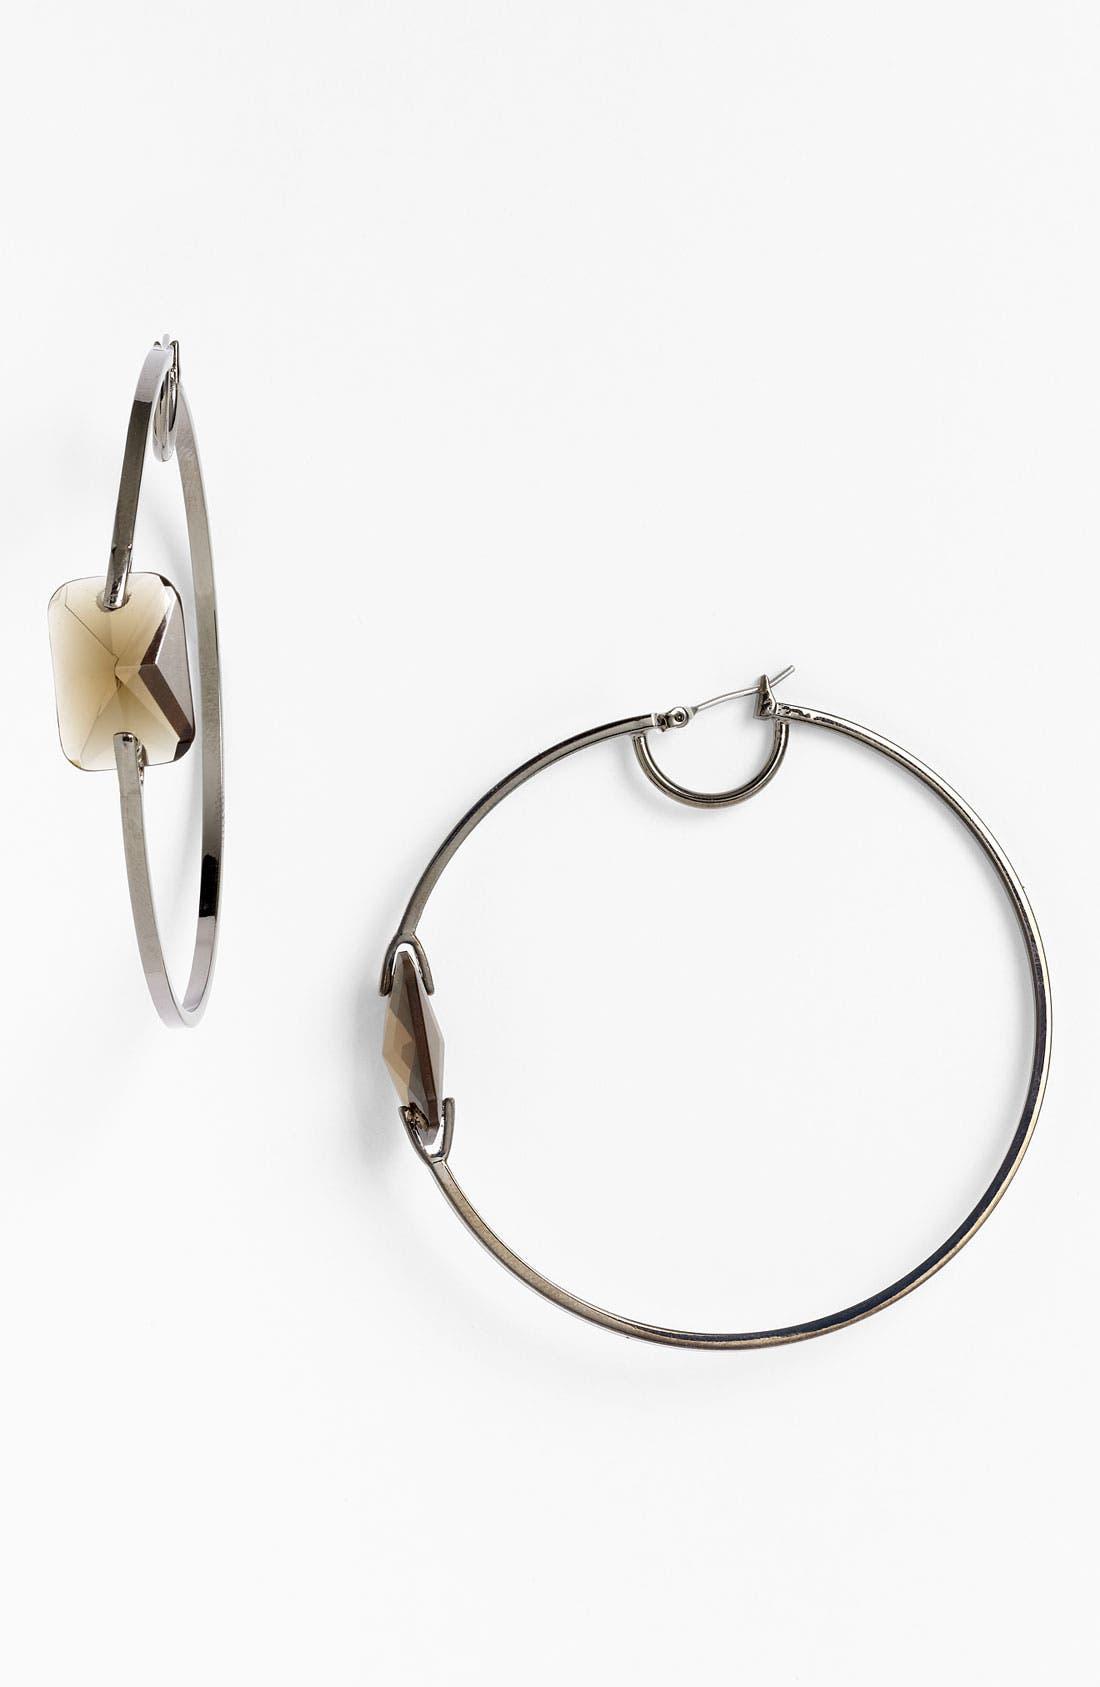 Alternate Image 1 Selected - Vince Camuto 'Basics' Stone Hoop Earrings